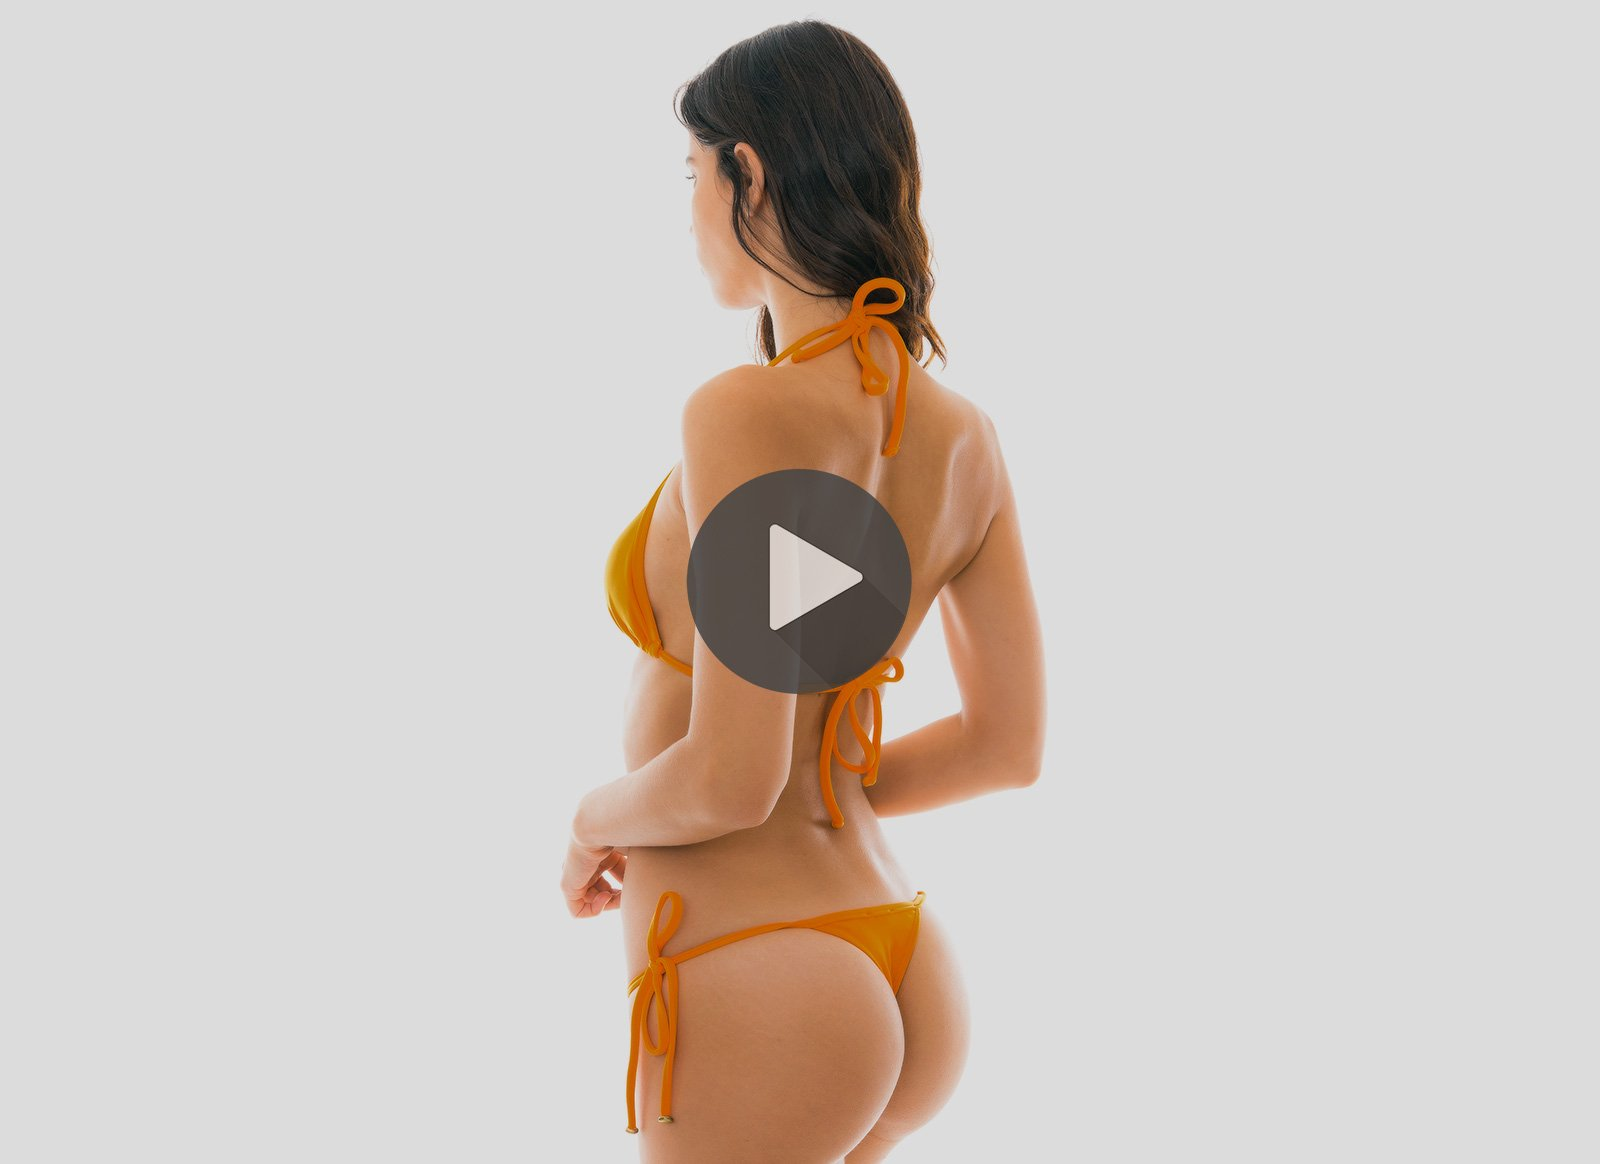 db1b68a706 Thong bikini - String | Brazilian thong bikini